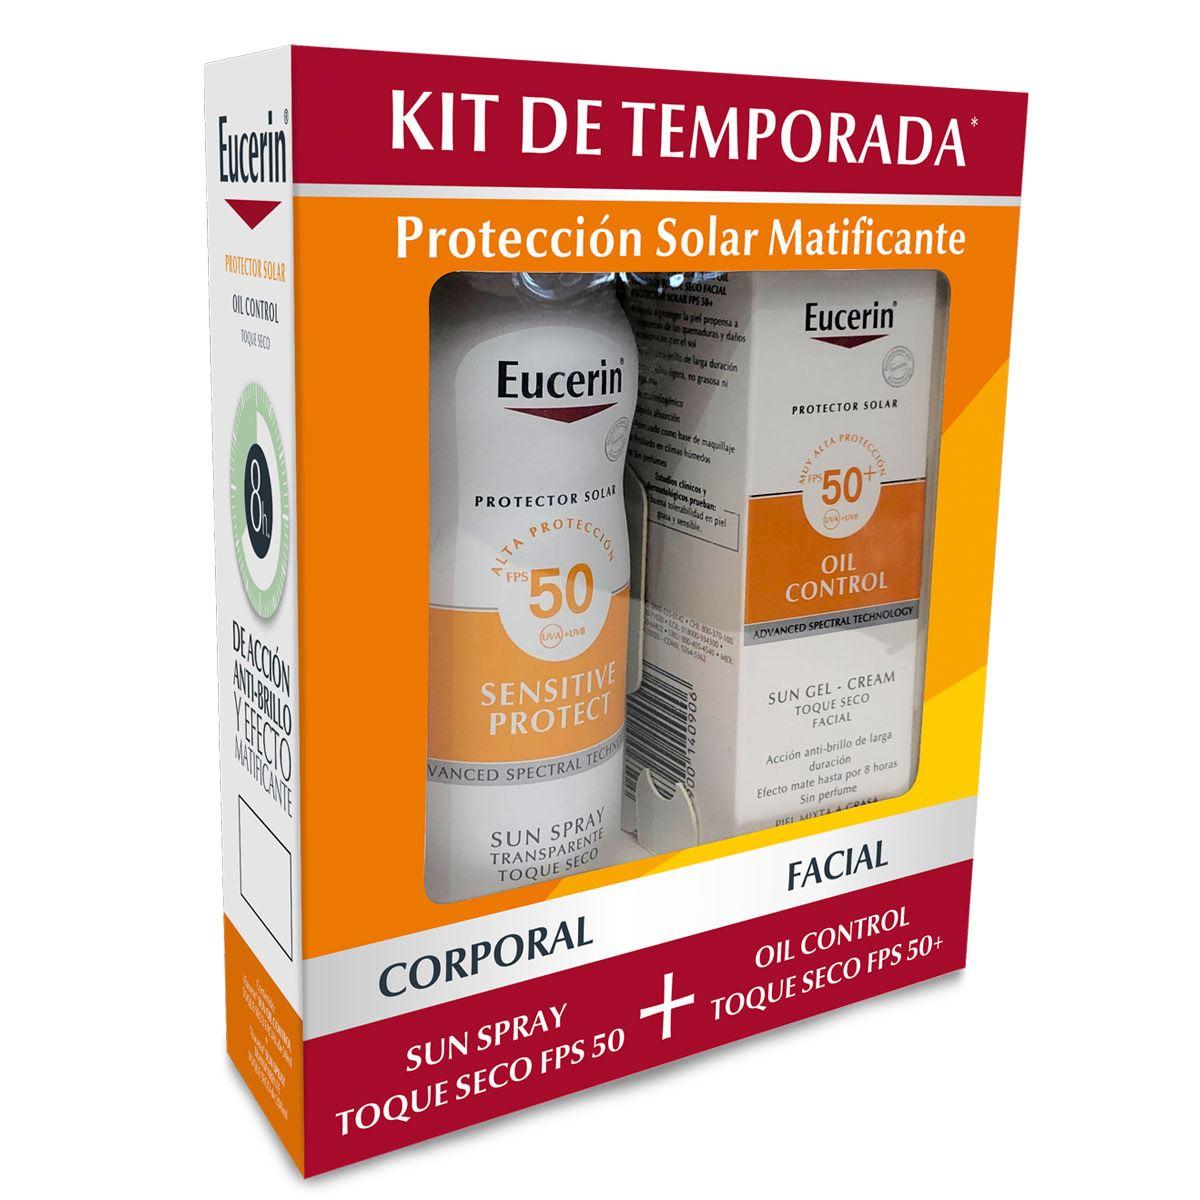 Kit protector solar matificante Eucerin (Oil Control + Aerosol toque seco)